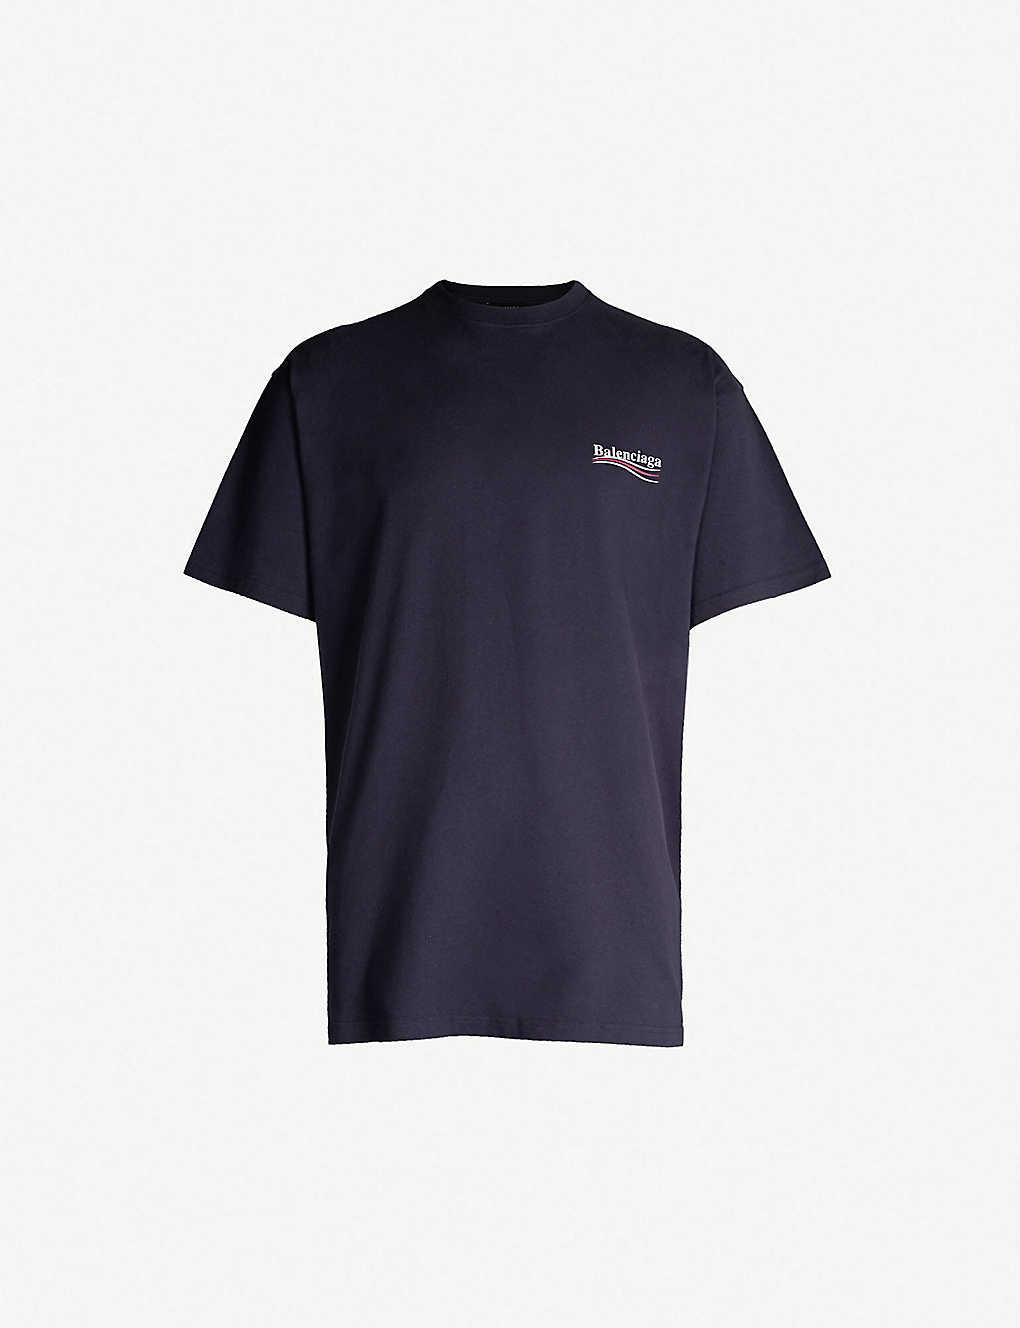 6013e77d1448 BALENCIAGA - Campaign logo-print cotton-jersey T-shirt | Selfridges.com